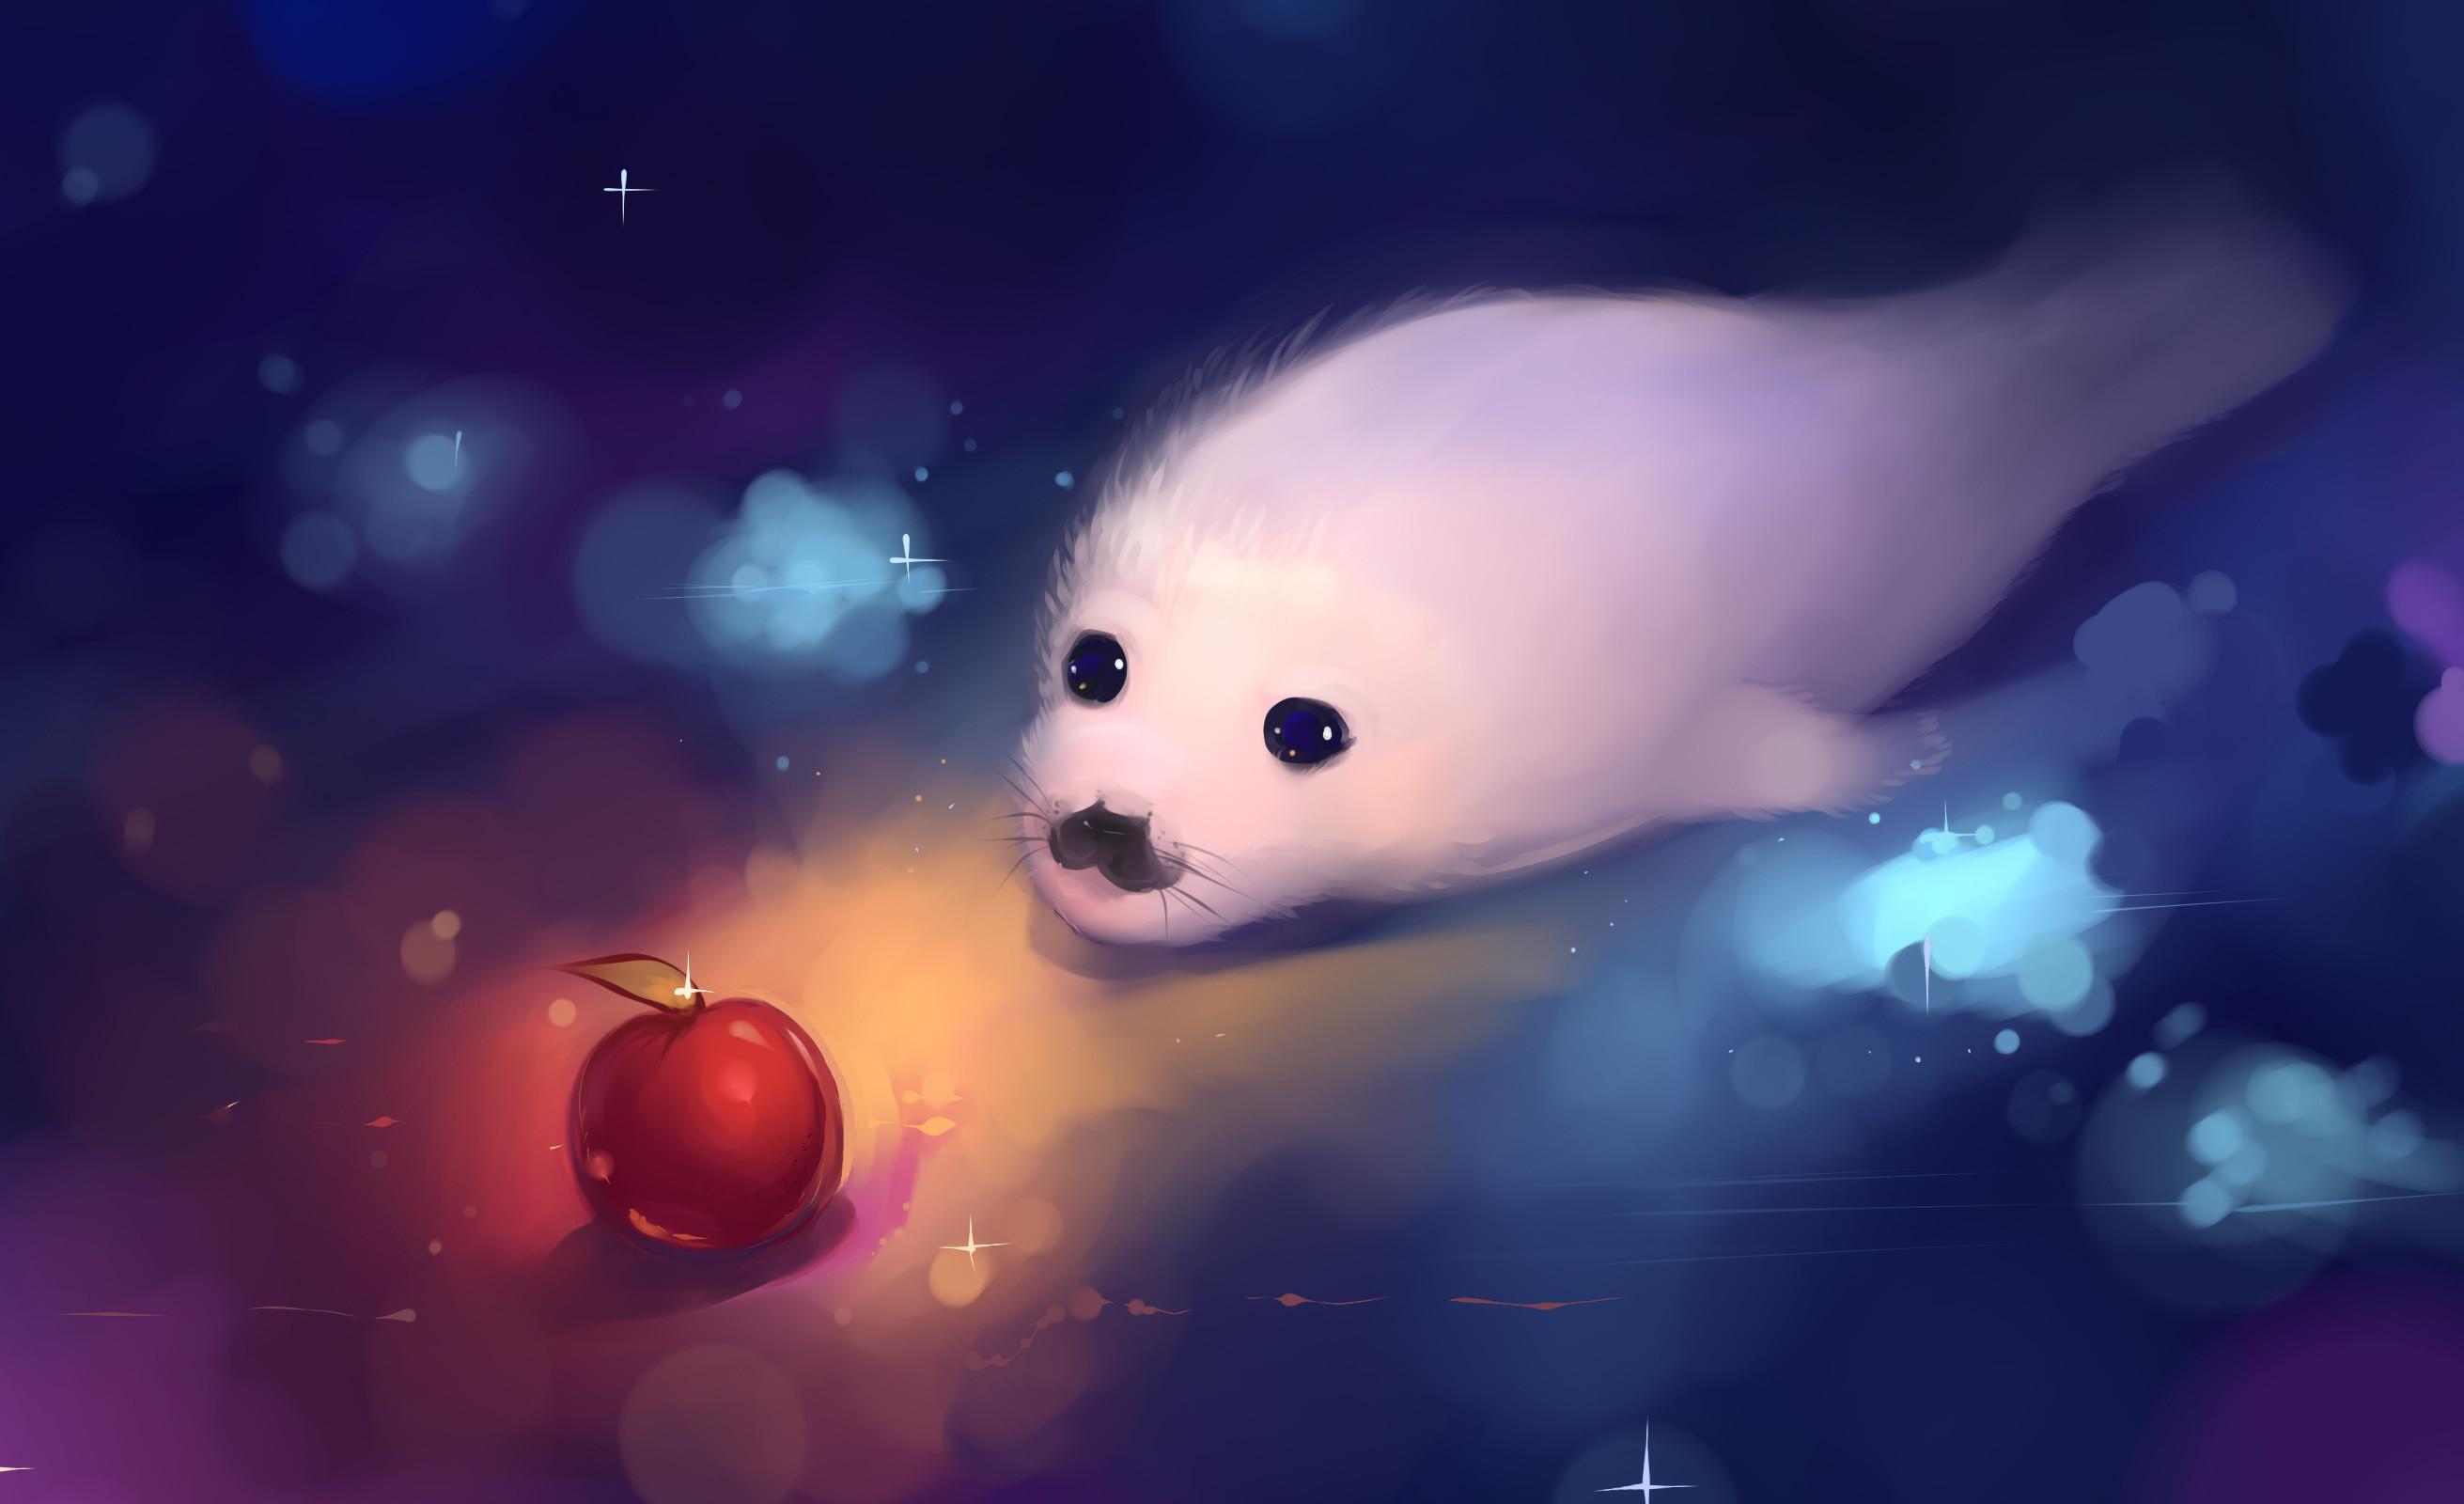 cute-animal-art-wallpaper-3